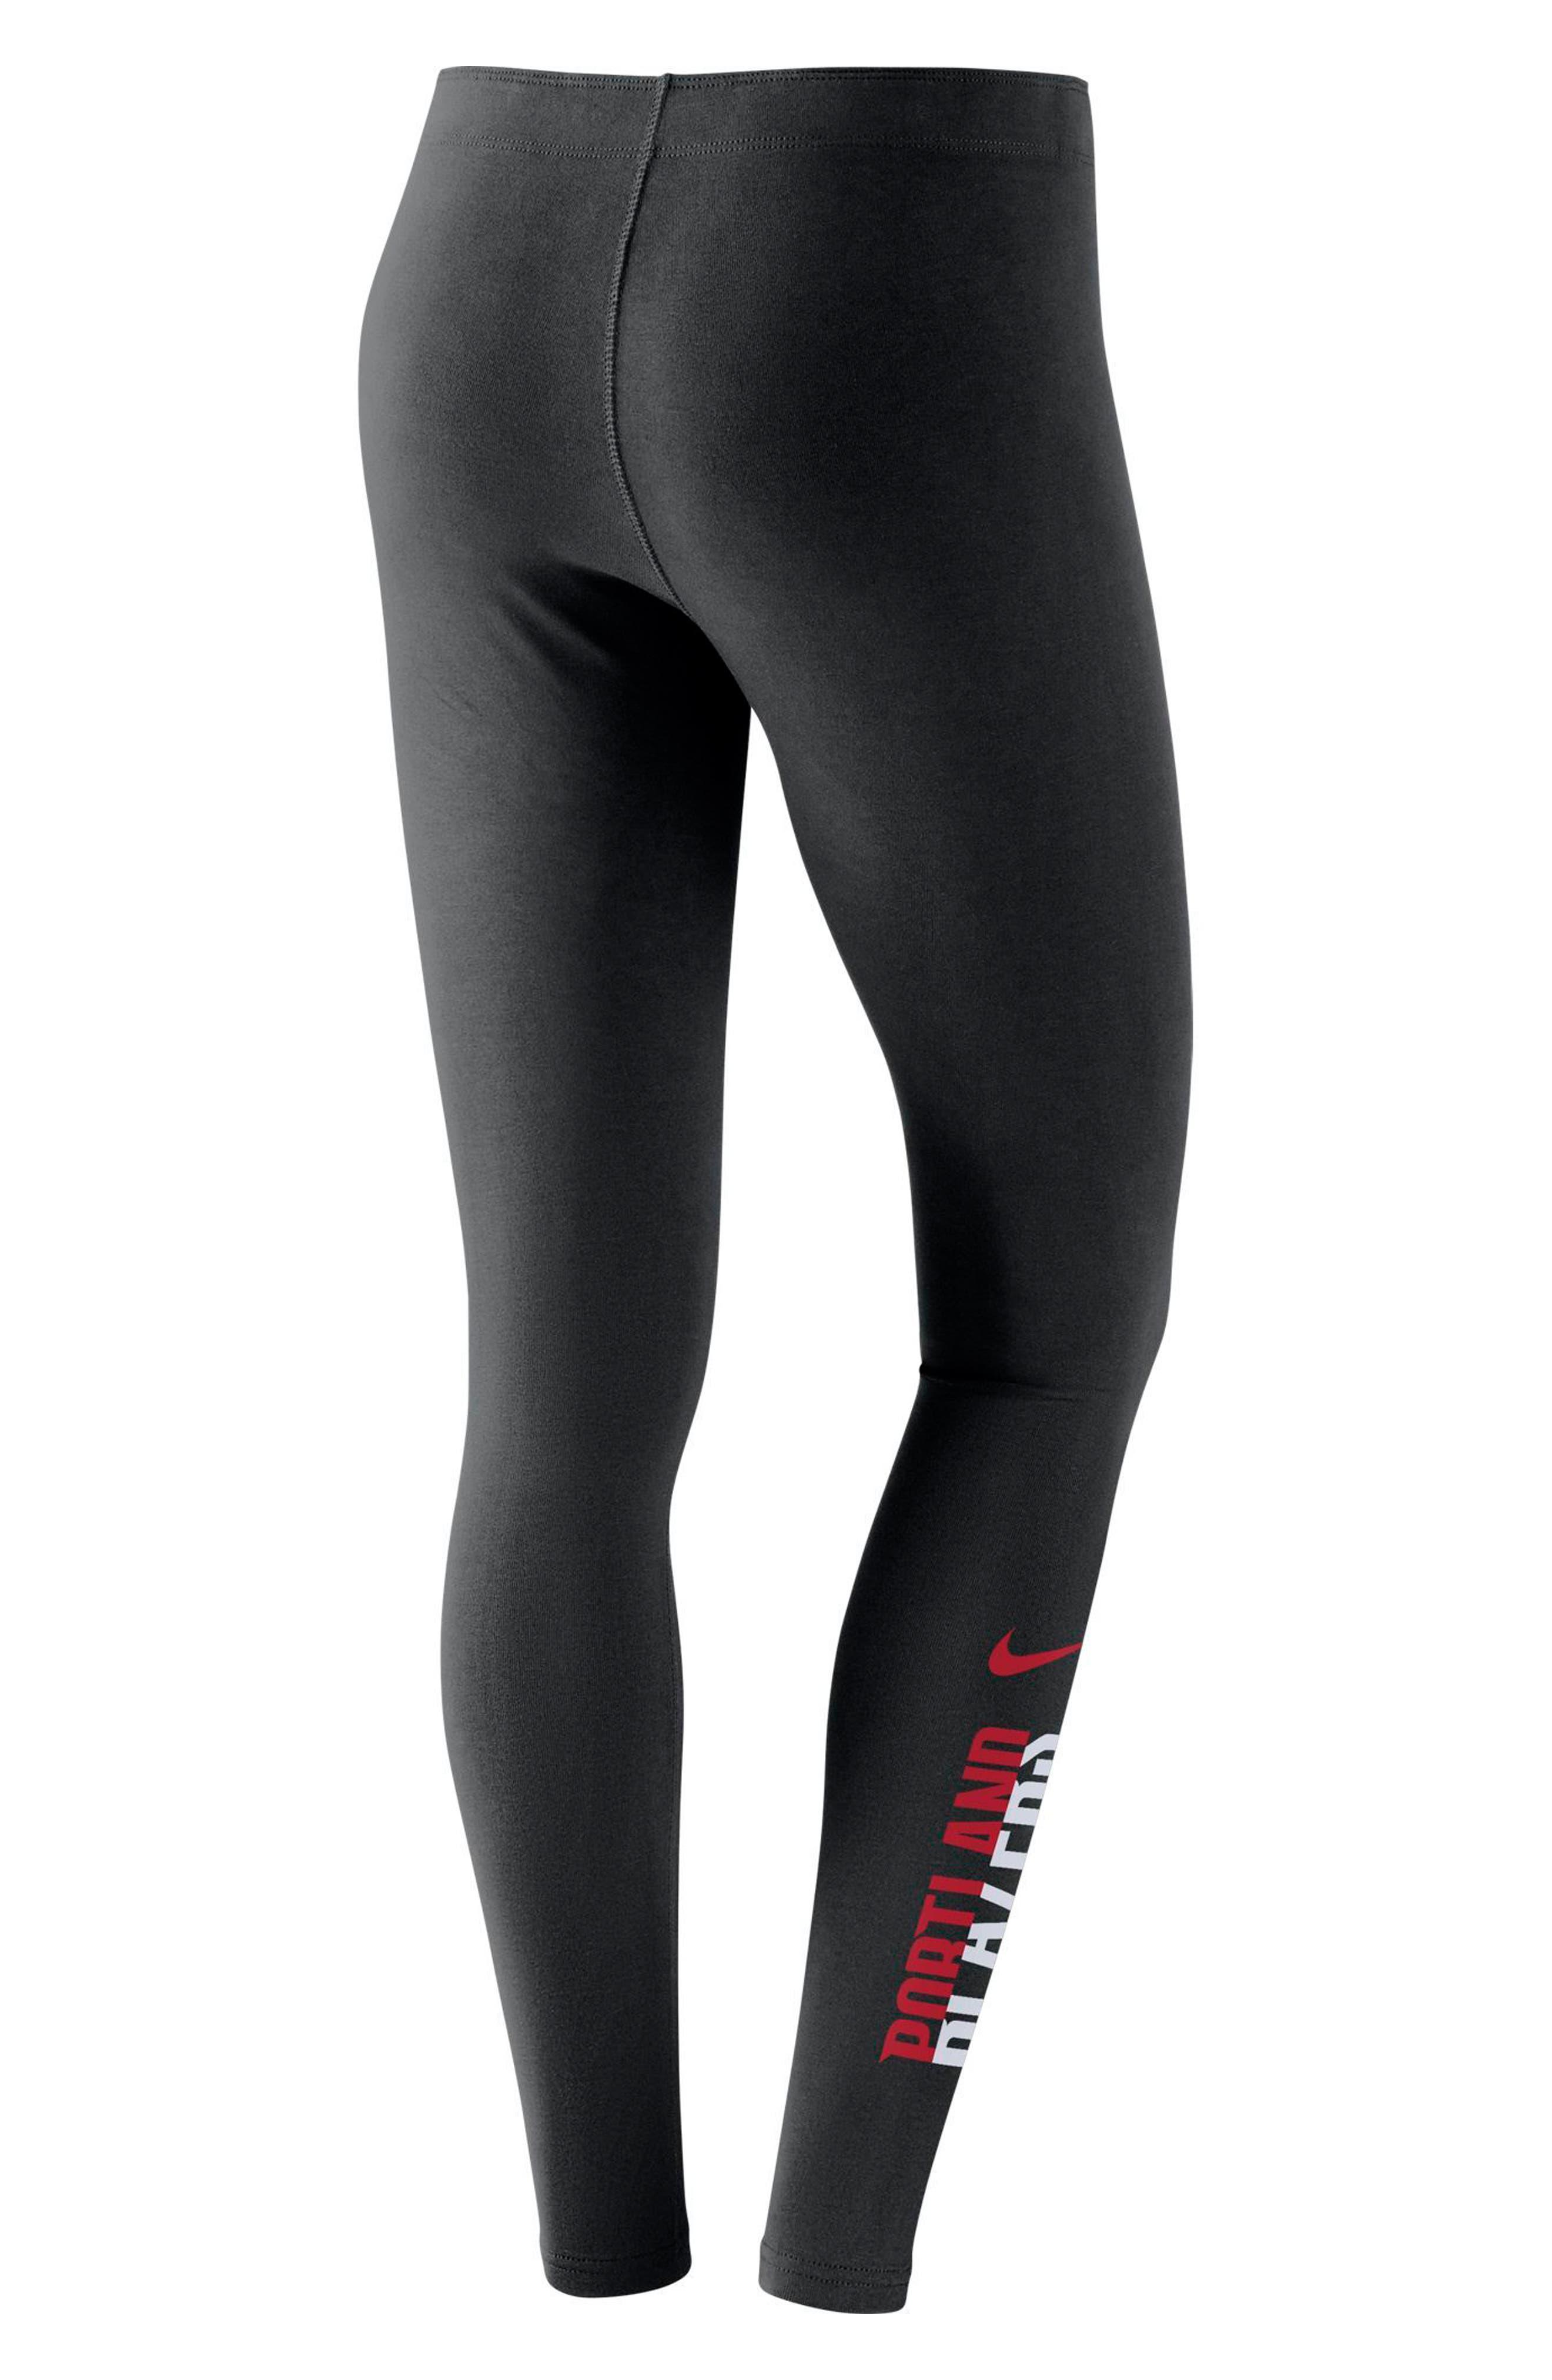 Portland Trail Blazers Leg-A-See Women's NBA Tights,                             Alternate thumbnail 2, color,                             Black